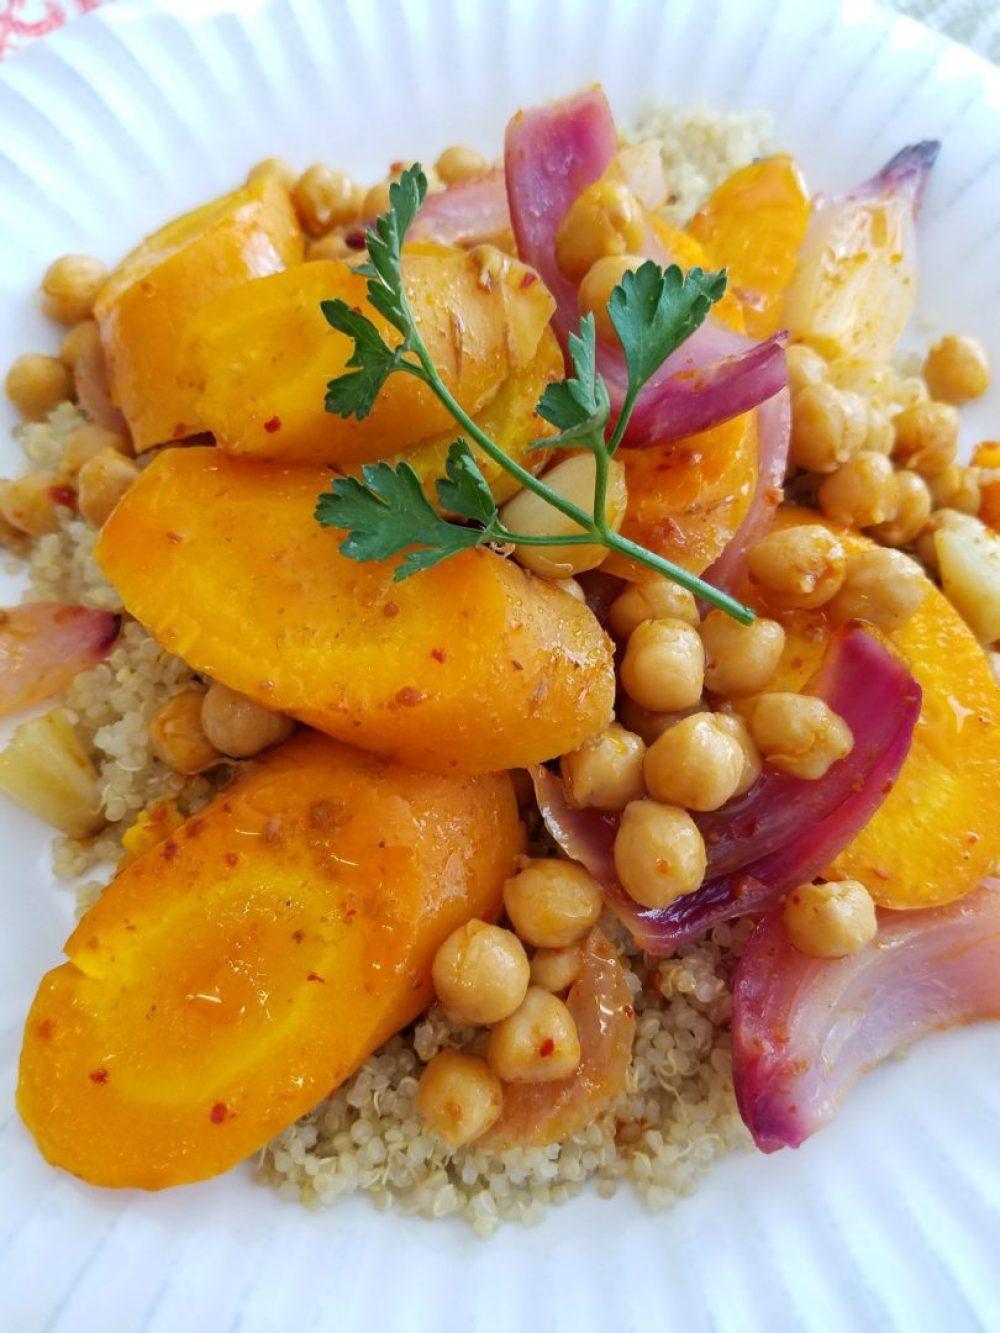 Chickpeas harissa carrots recipe